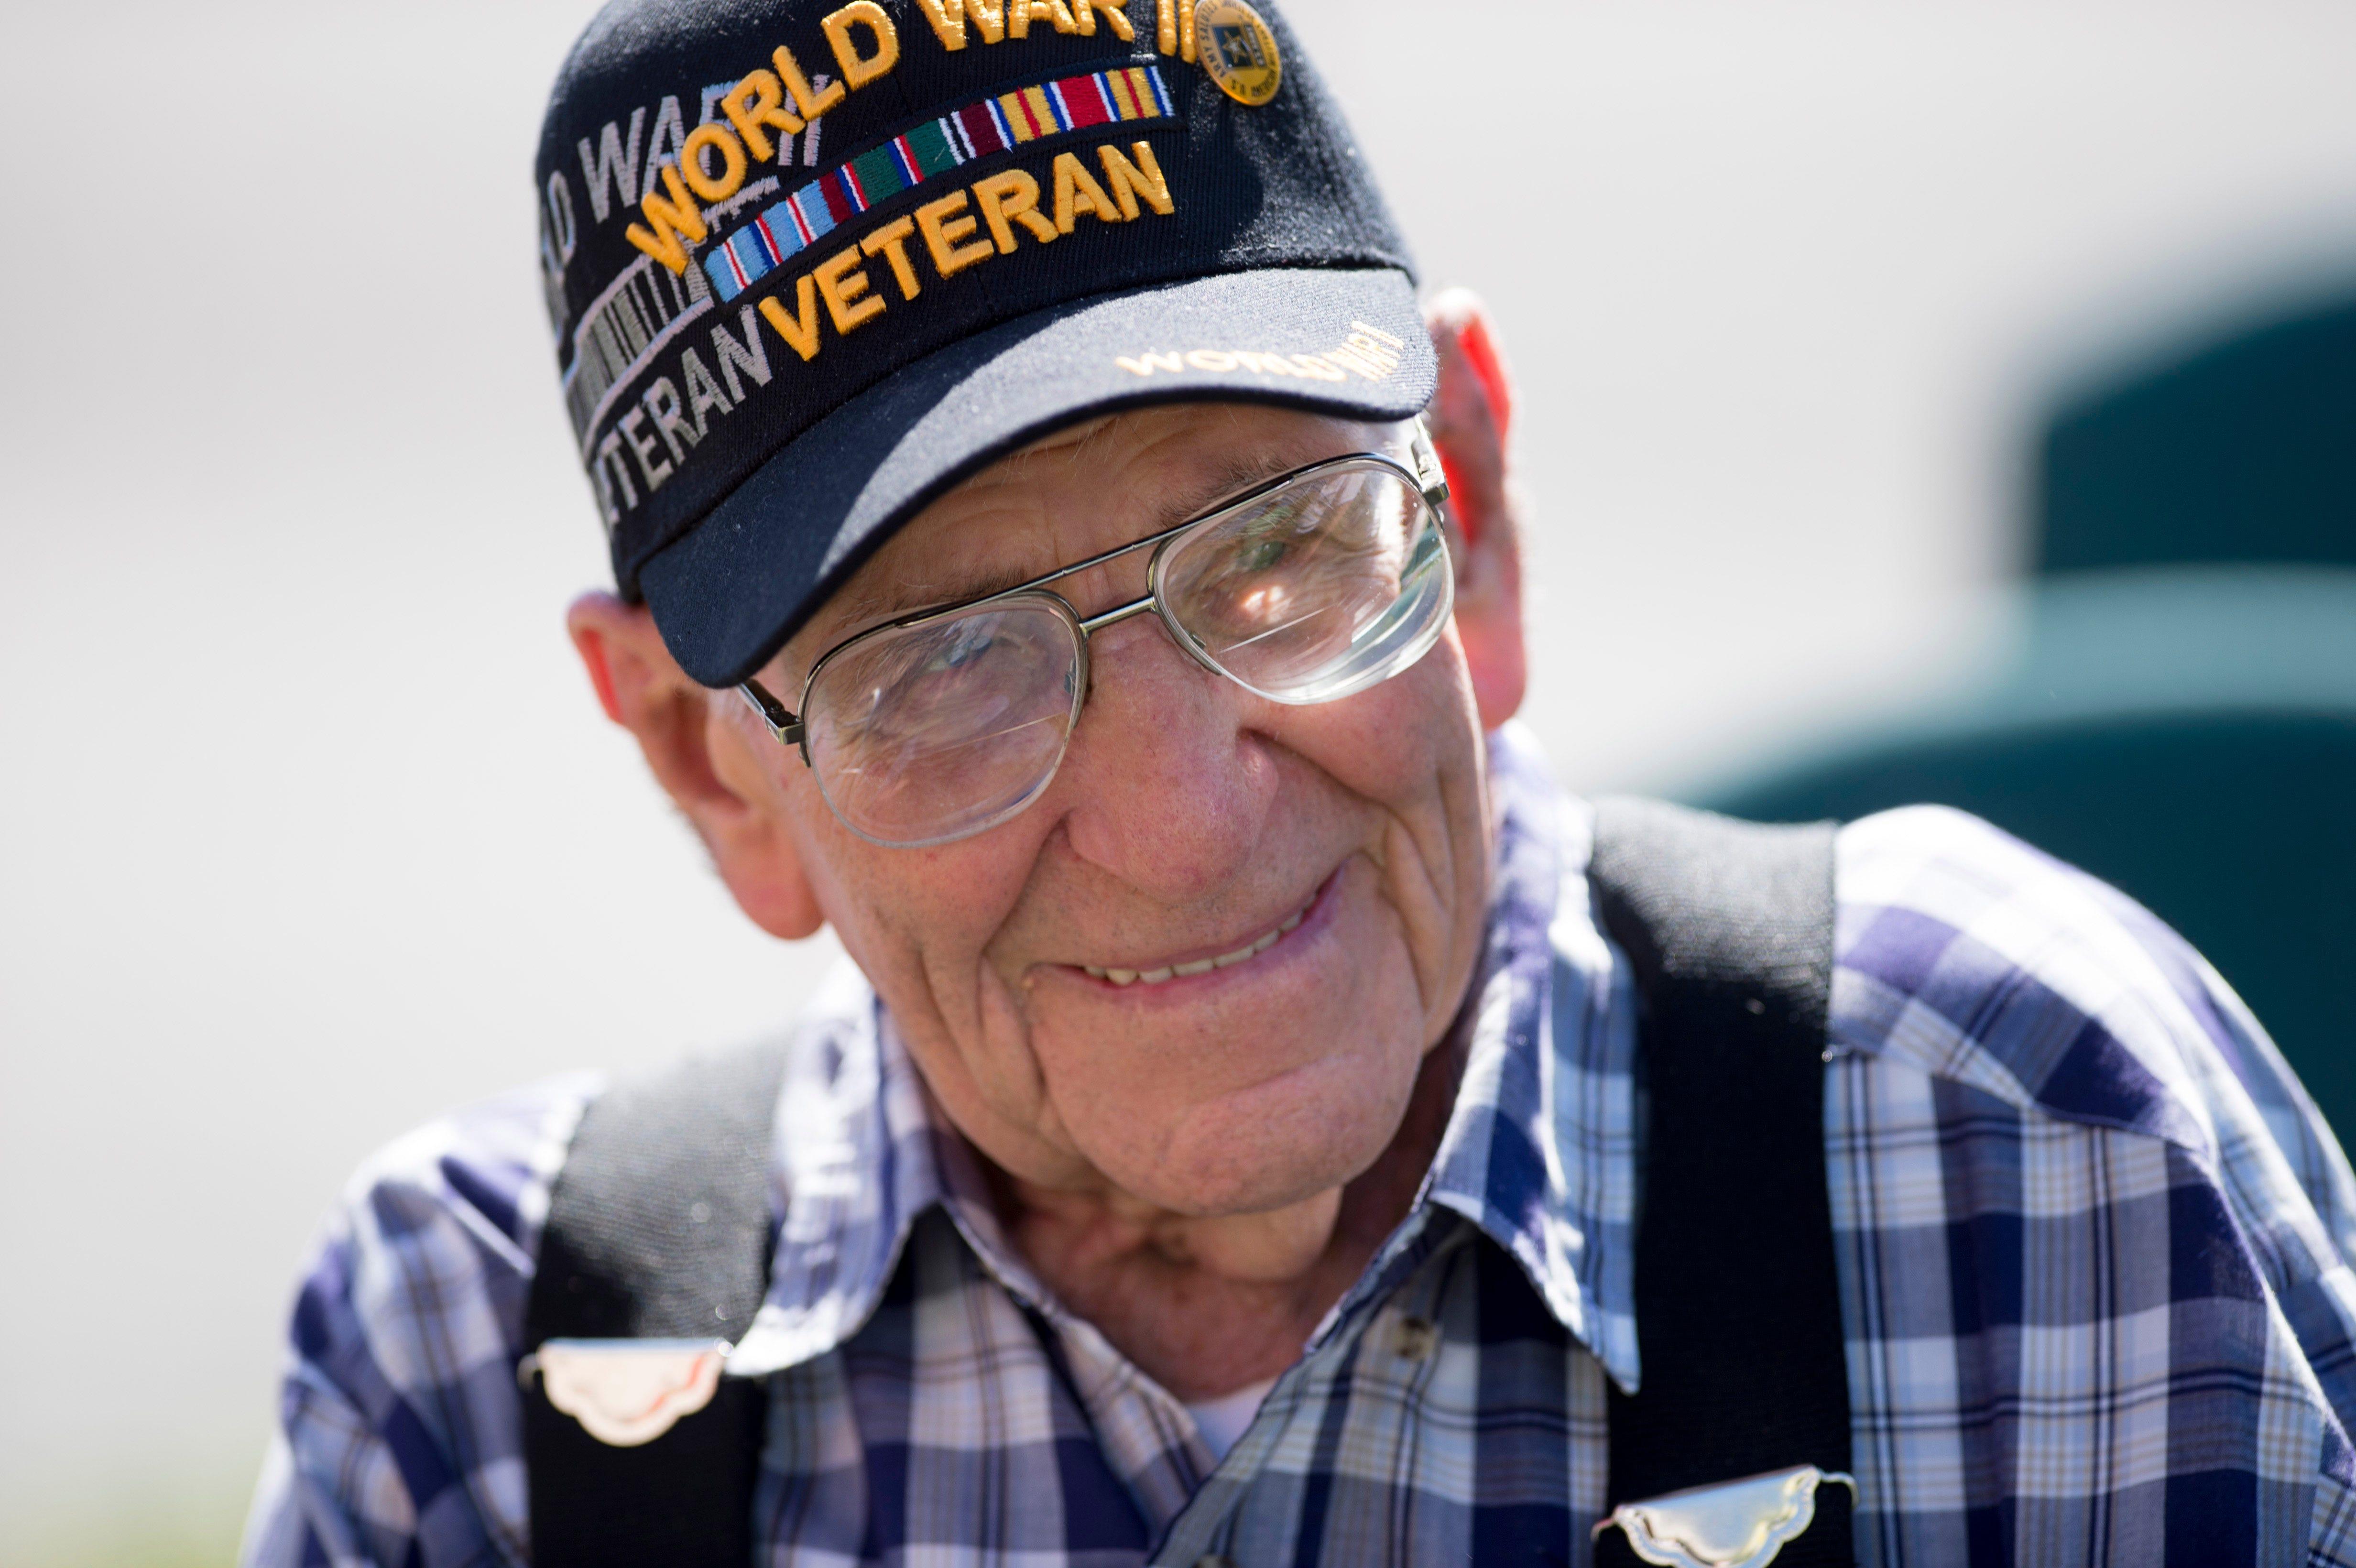 U.S. Army World War II veteran Carl Mann of Evansville attends the Memorial Day services at Alexander Memorial Park on Evansville's West Side in 2017.